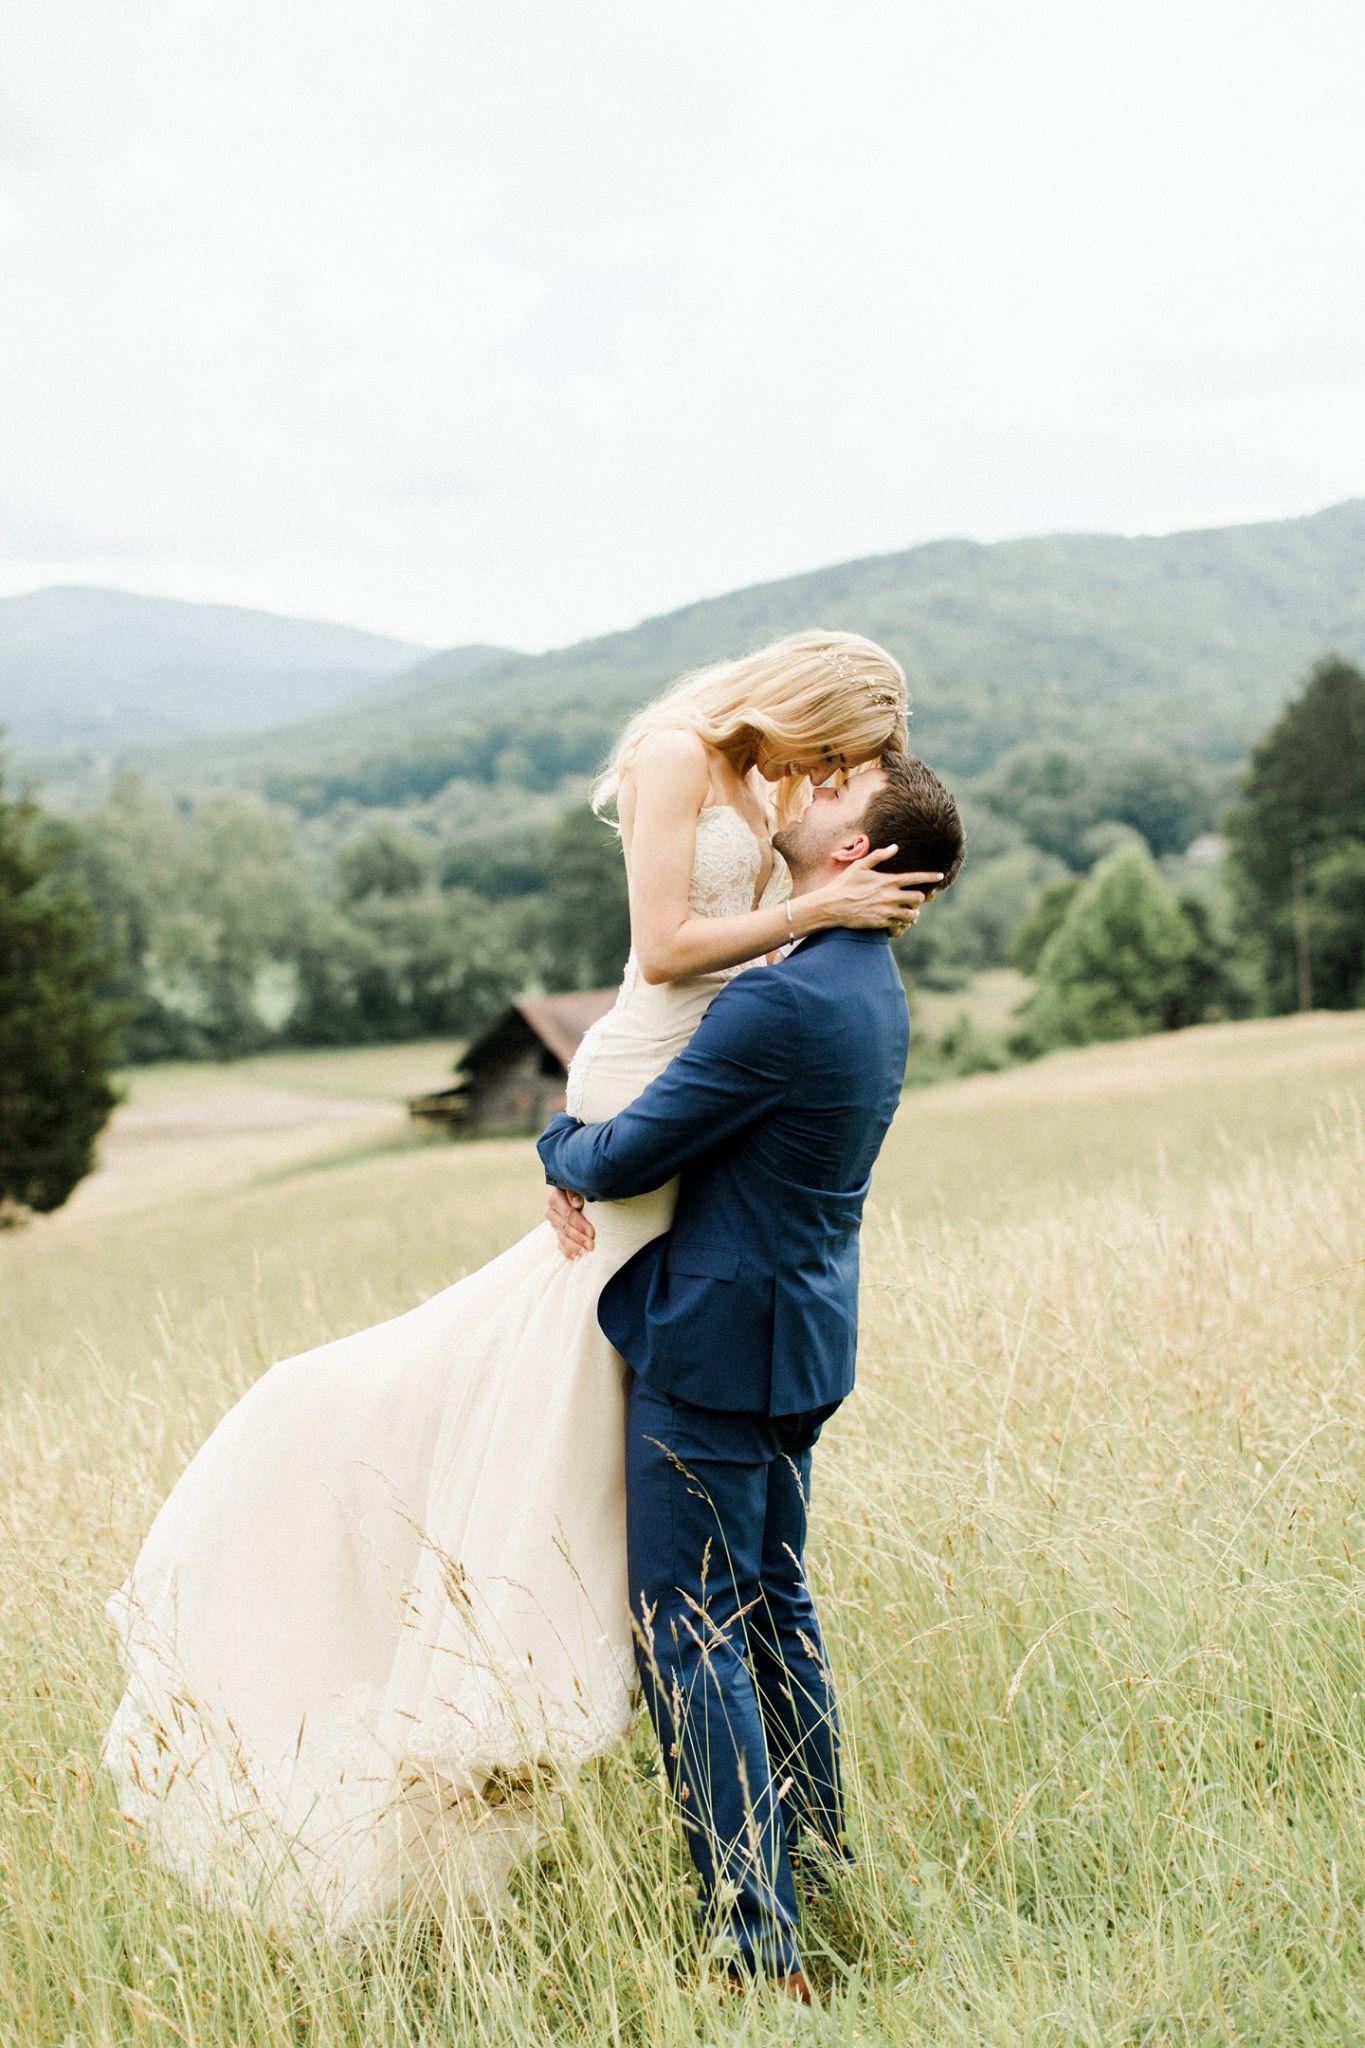 kari in blue ridge wedding in the grass in her ines di santo wedding dress